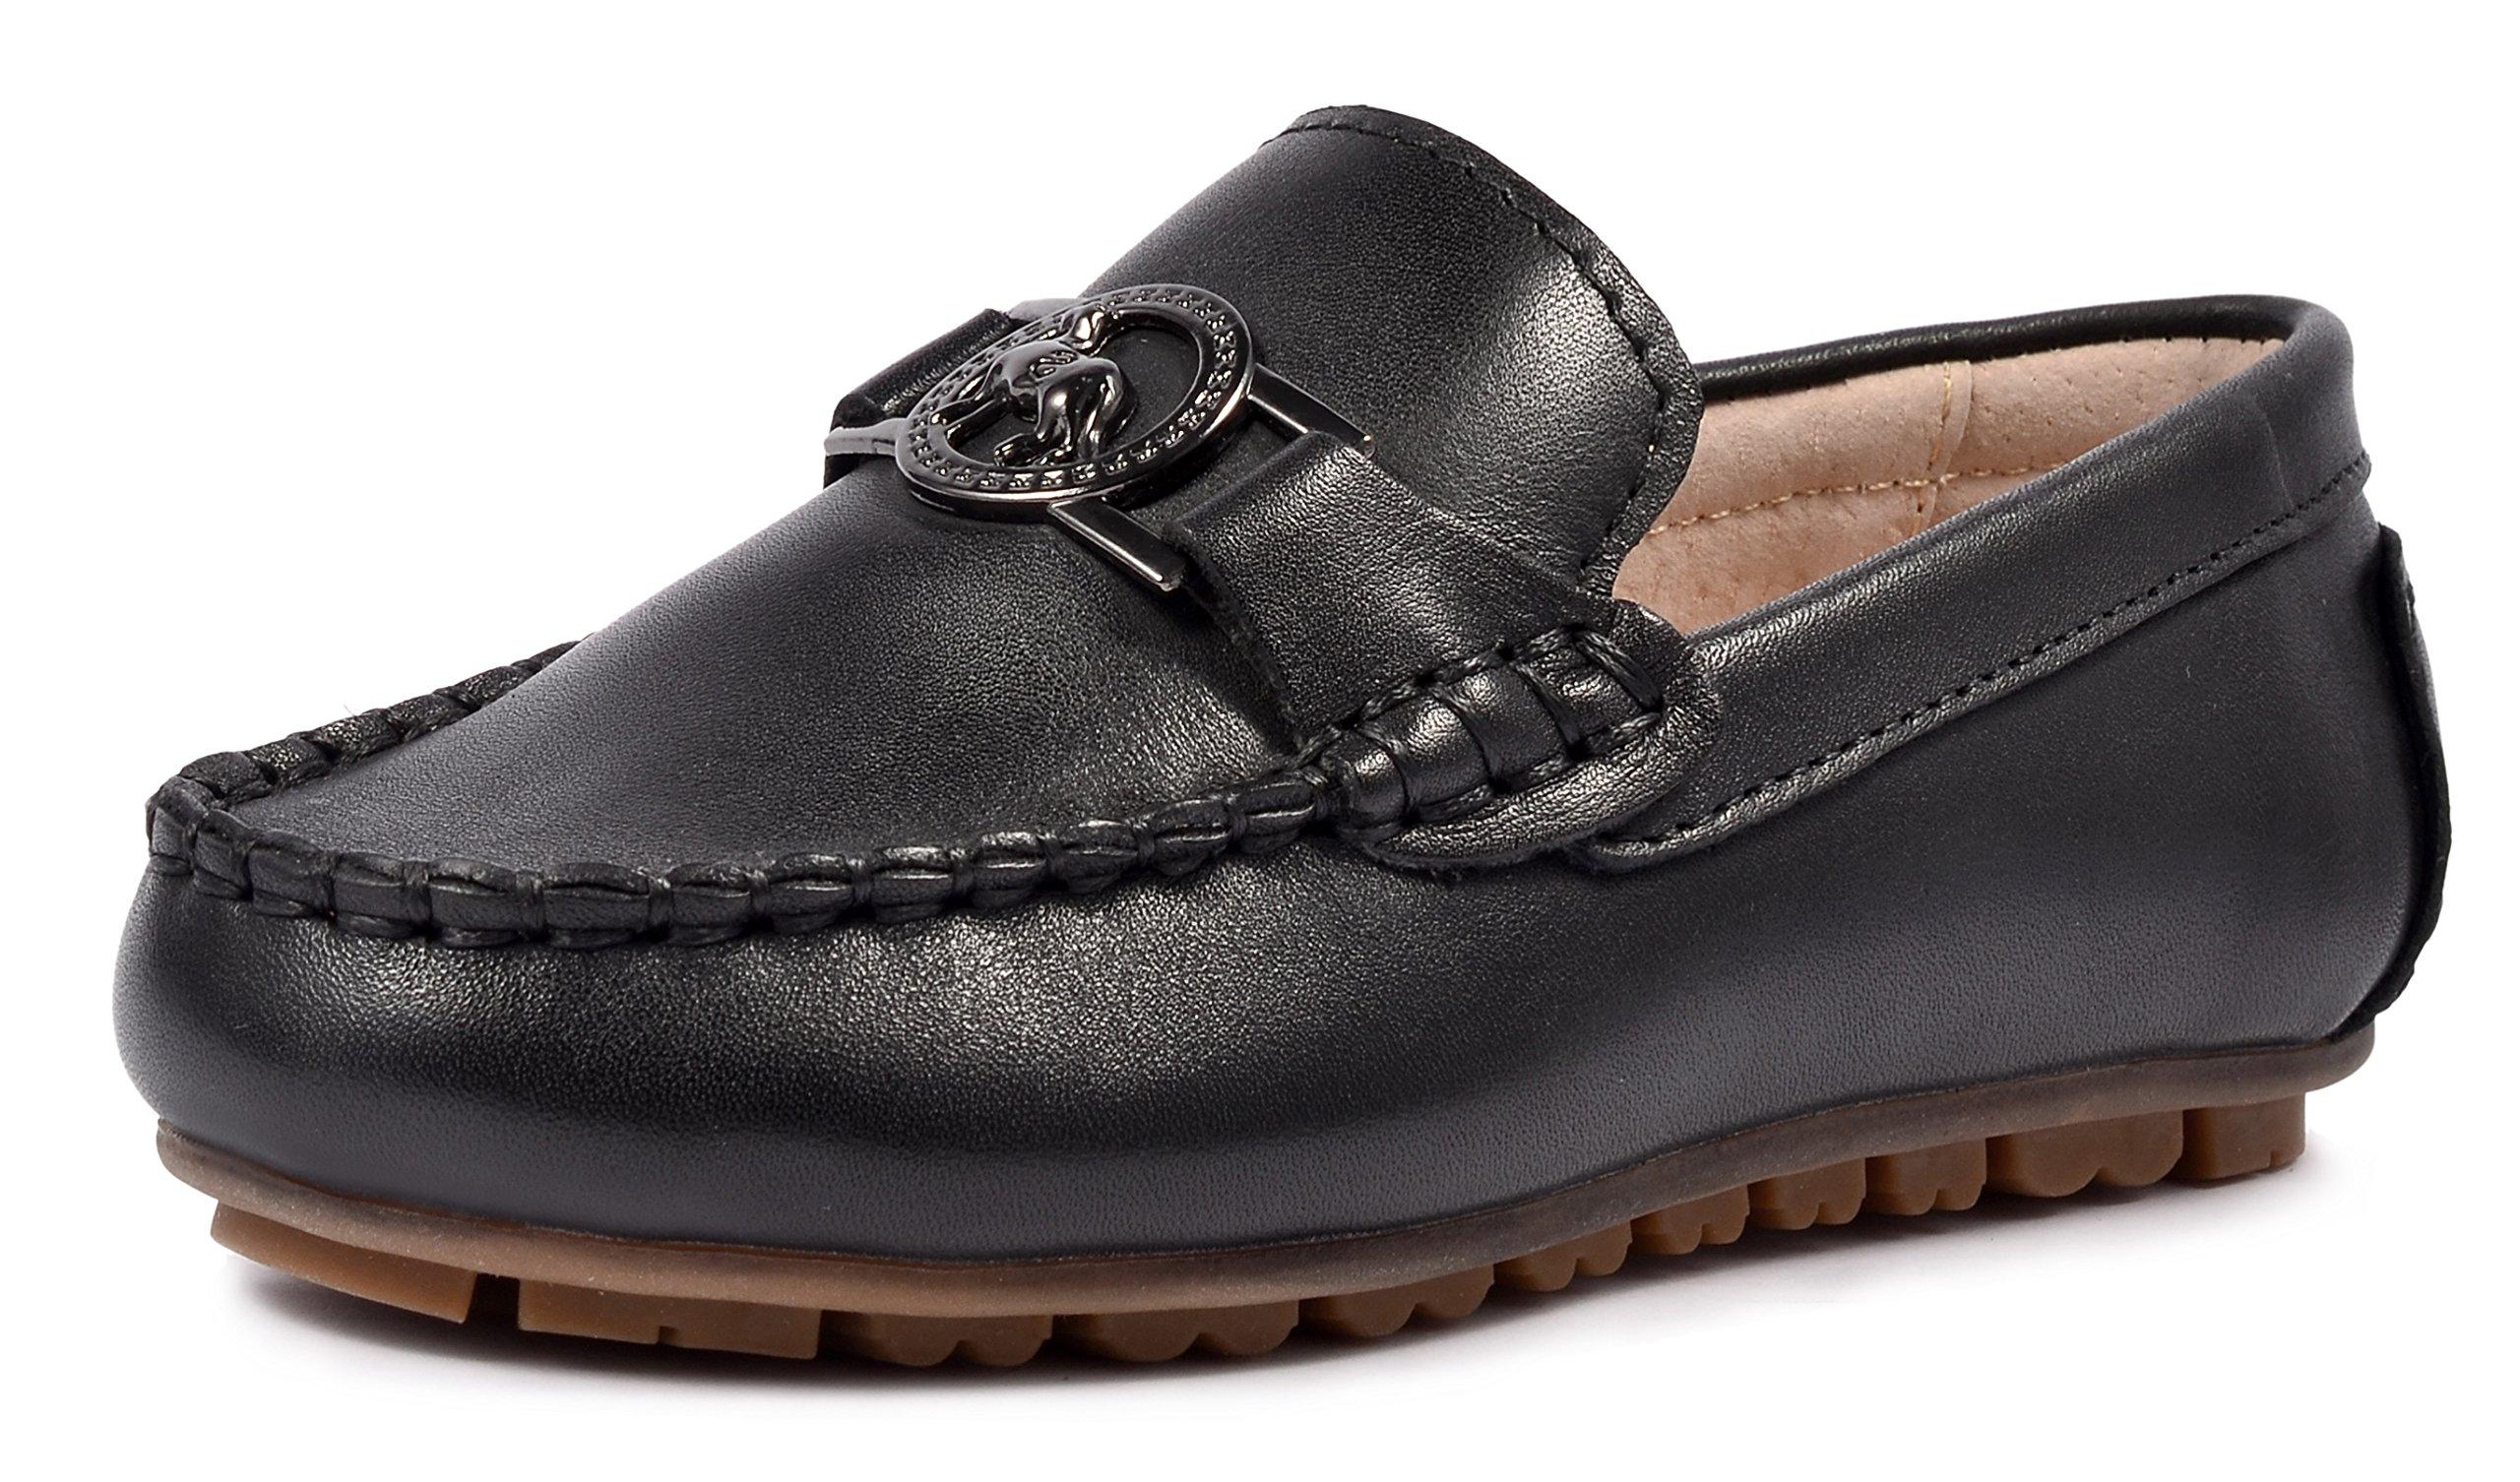 LIYZU Boy's Leather Distressed Loafers Dress Oxford Shoes (Toddler/Little Kid/Big Kid) US Size 12.5 Black